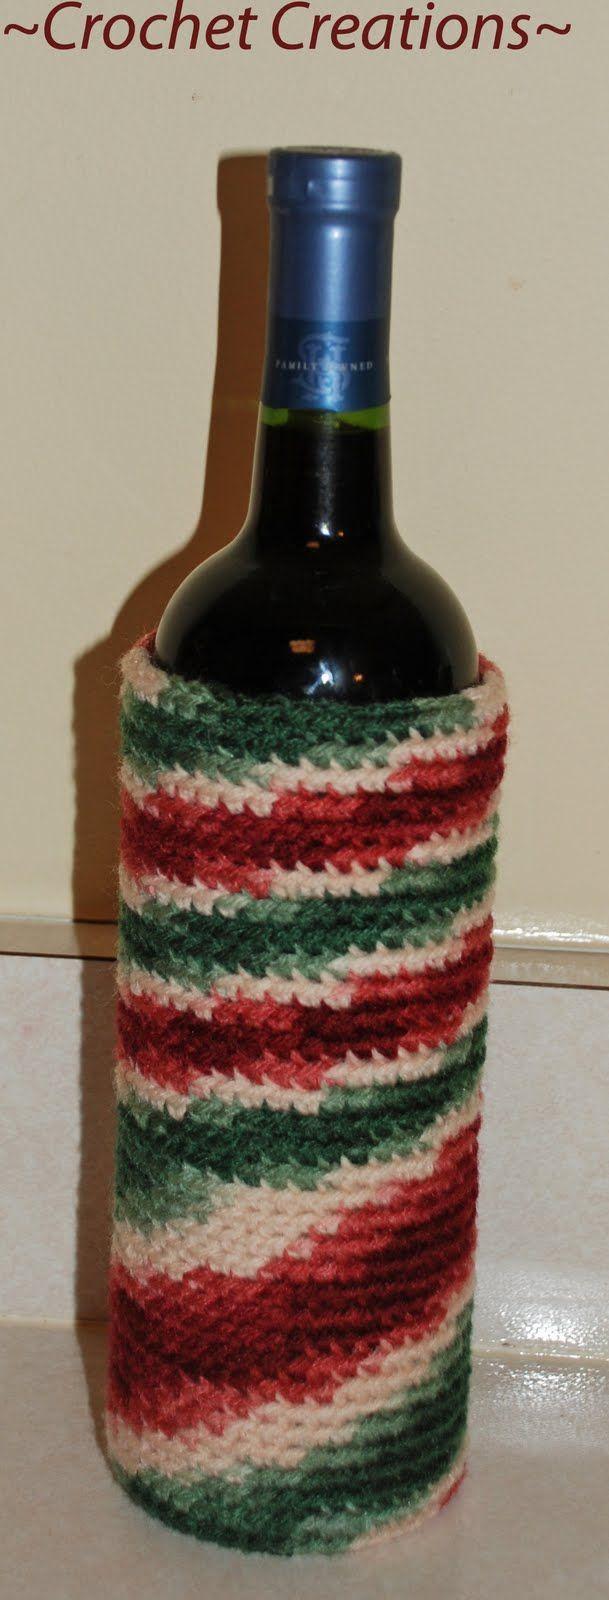 Crochet Creative Creations- Free Patterns & Instructions: Crochet ...